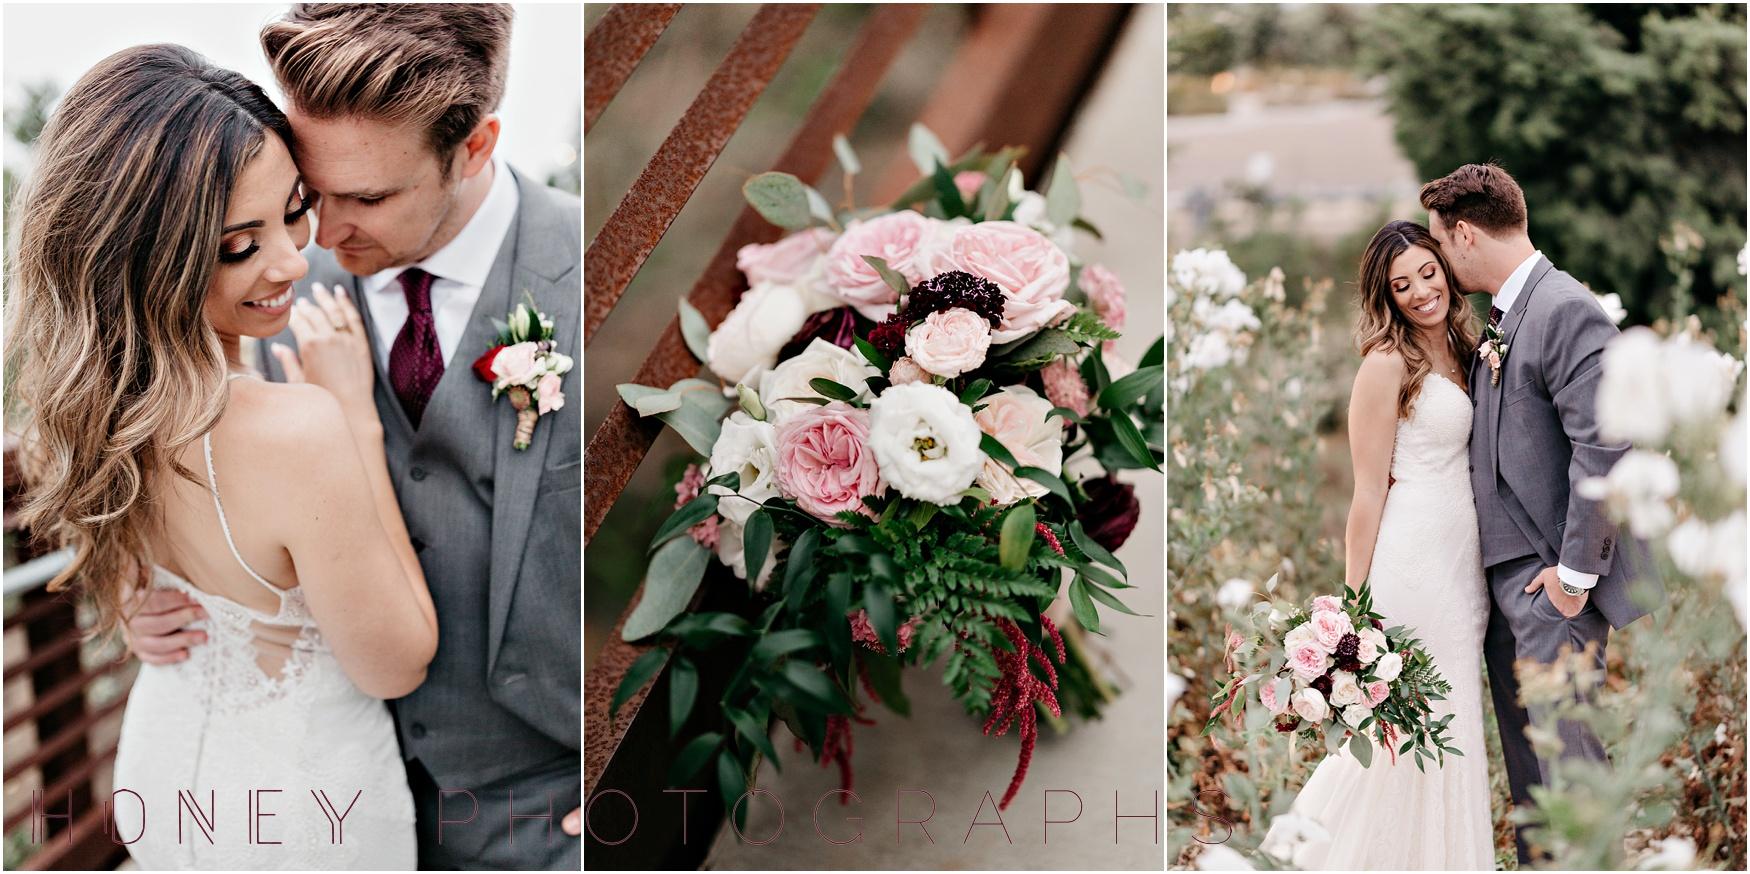 garden-classic-burgundy-jewel-tone-luxury-pacific-event-oceanside-wedding48.jpg